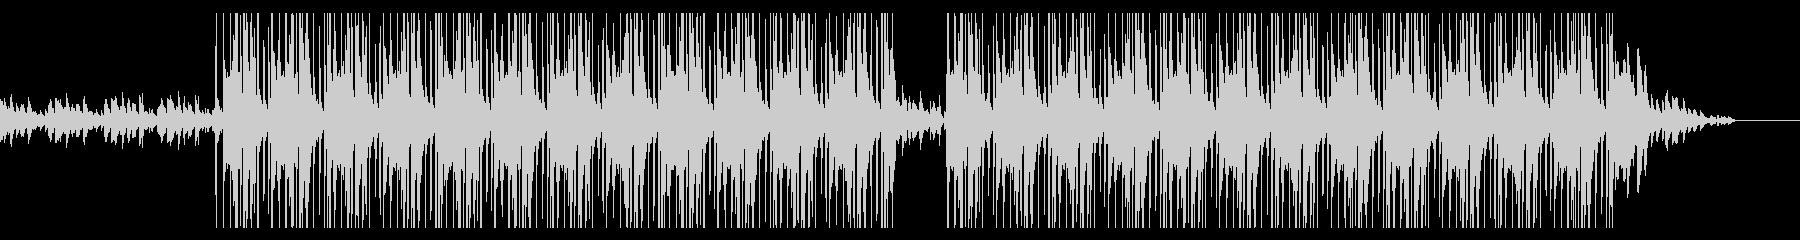 Lofi・チルアウト・ヒップホップの未再生の波形